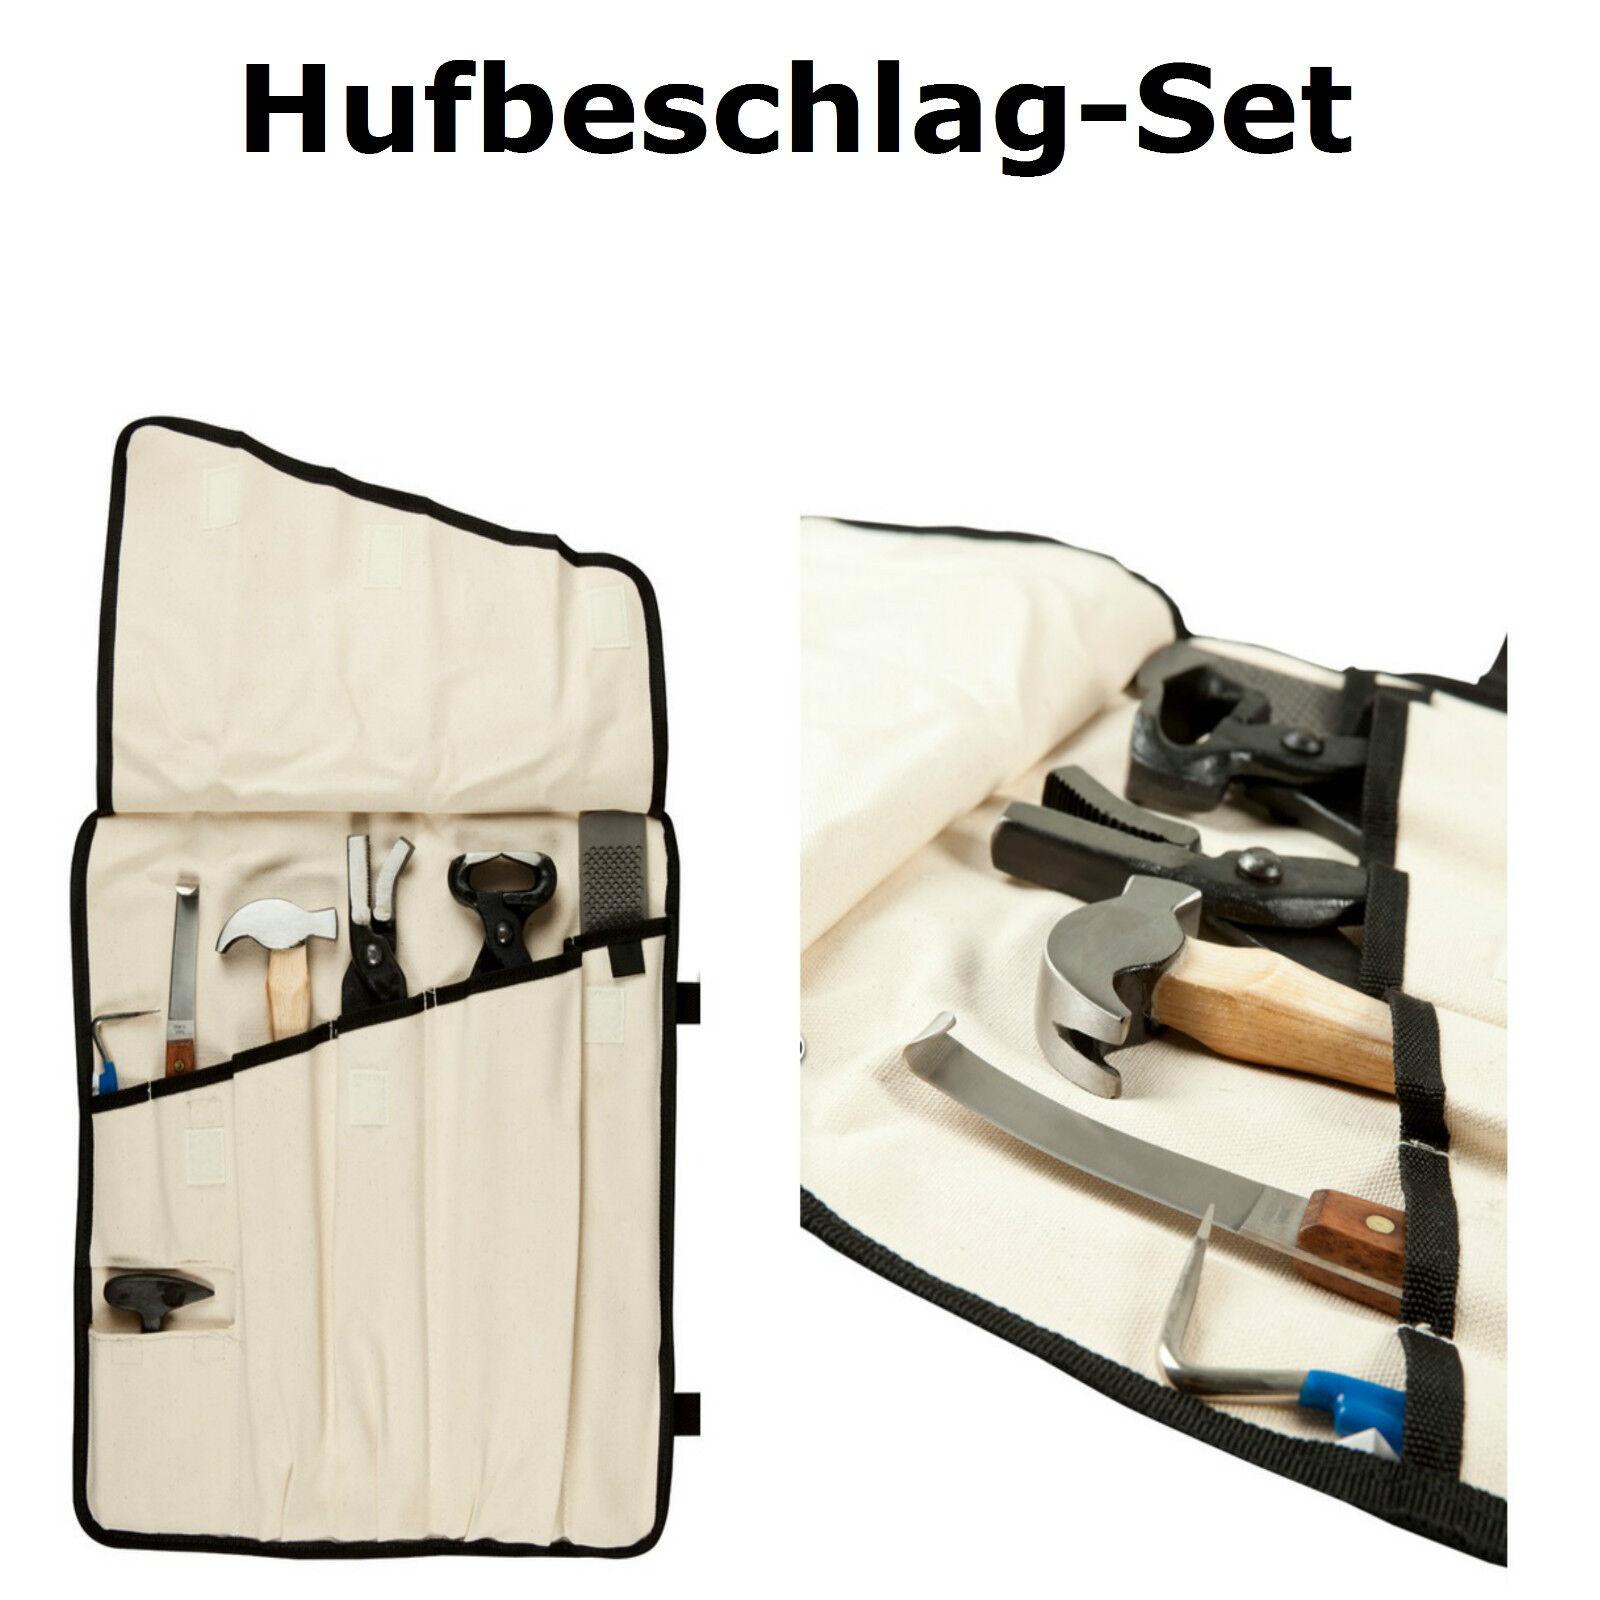 Beschlagset Hufbeschlagset Hufbeschlag Hufbeschlag Hufbeschlag Hufpflege Barhufpflege Schmied 4df214